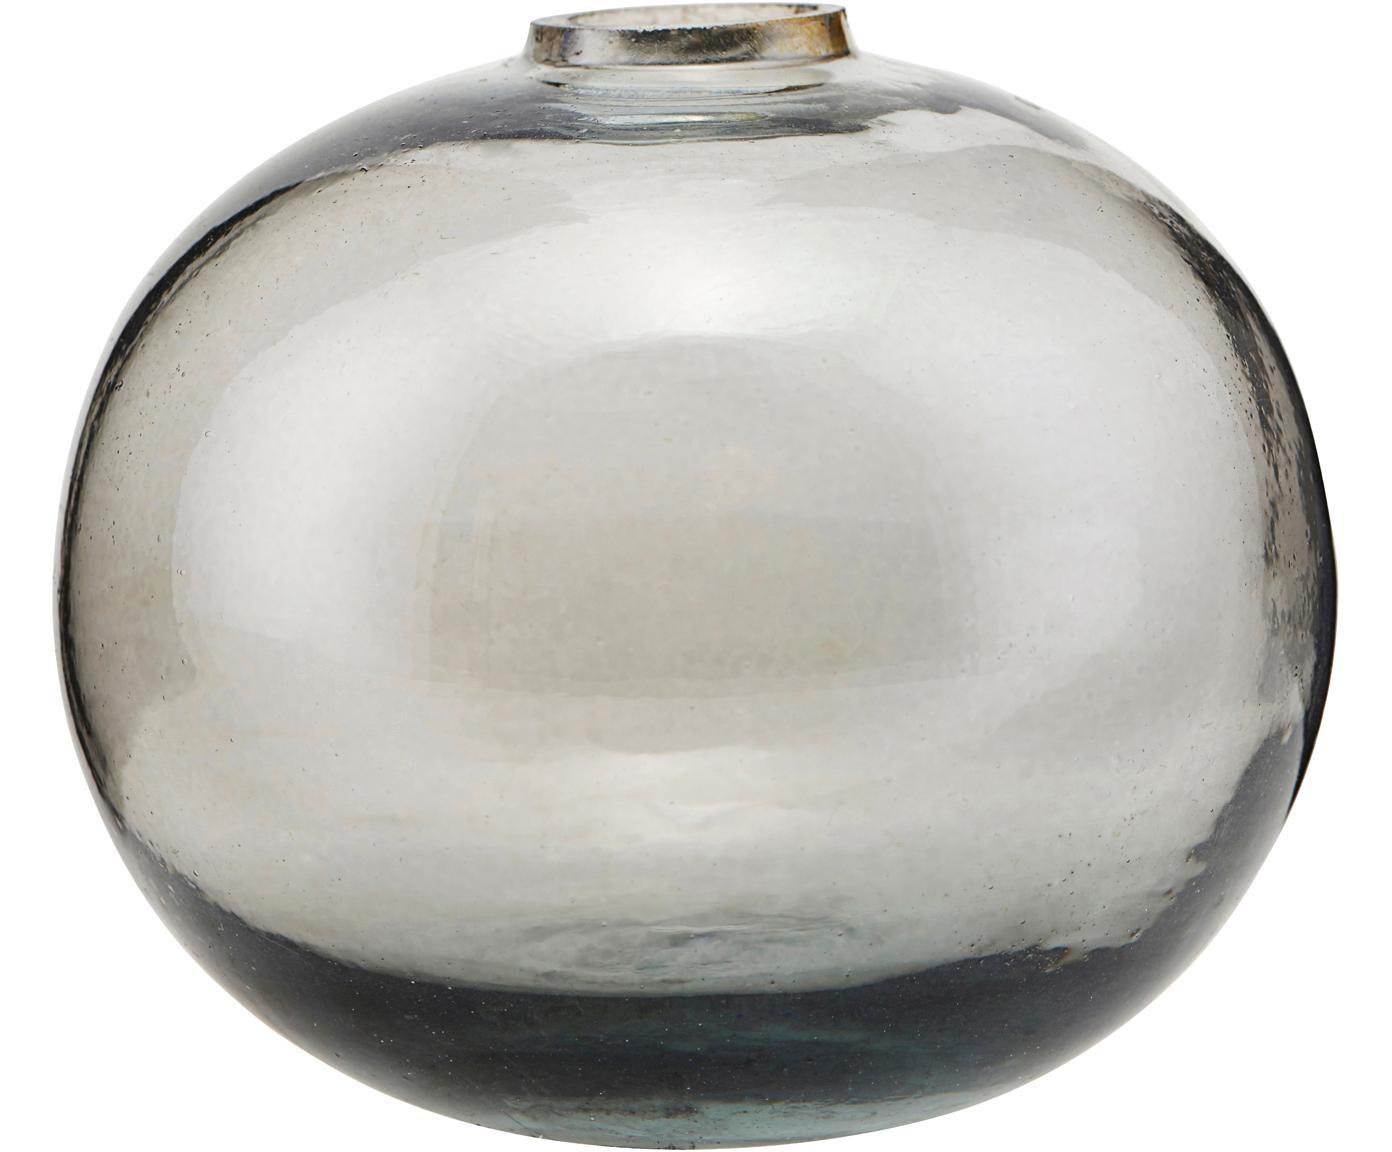 Jarrón de vidrio Sandra, Vidrio, Gris, transparente, Ø 8 x Al 7 cm